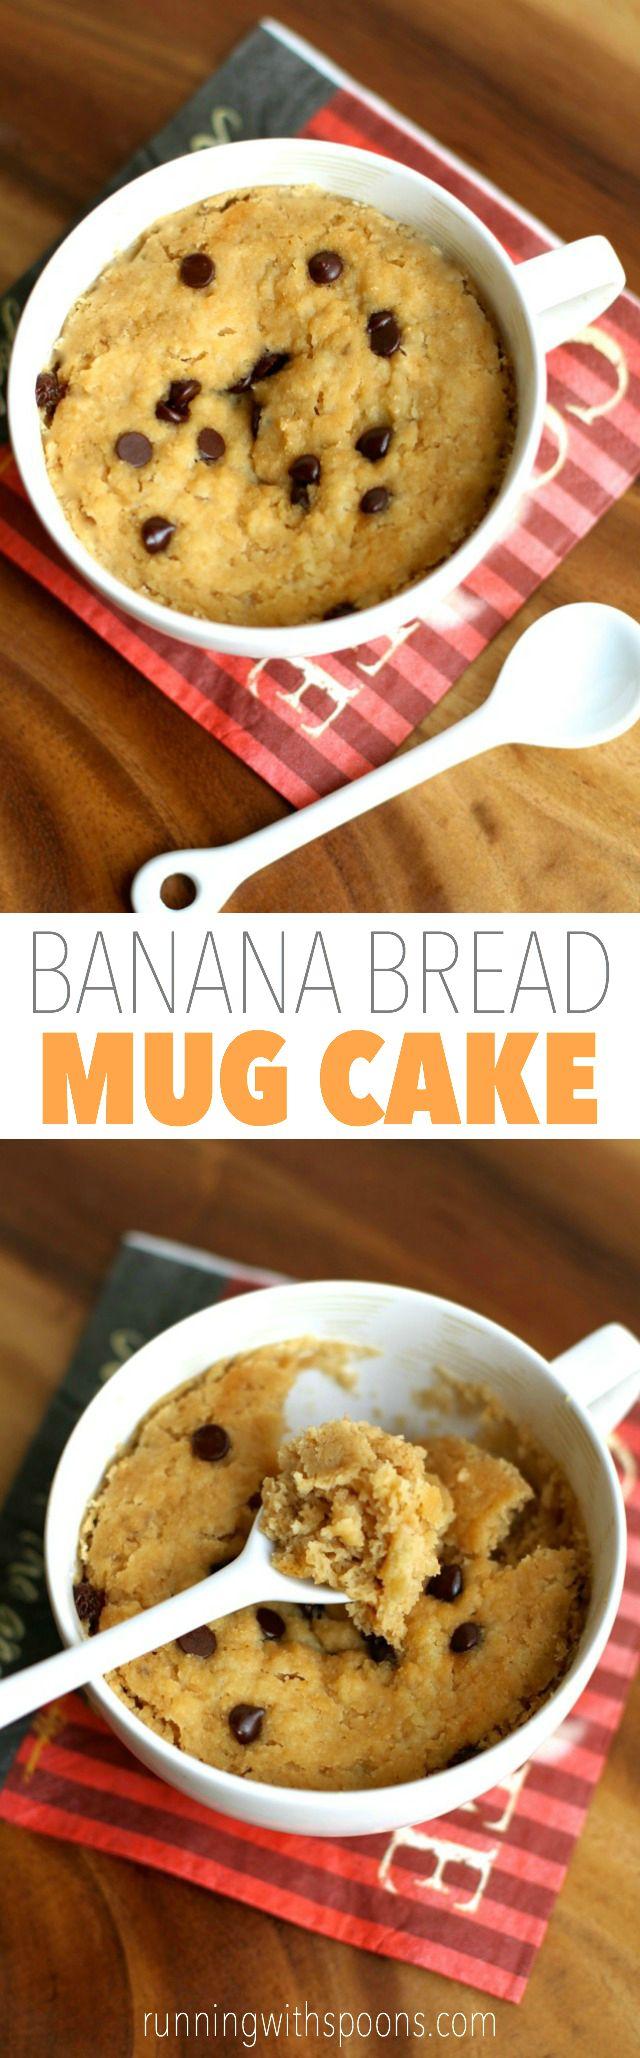 Banana Bread Mug Cake Running With Spoons